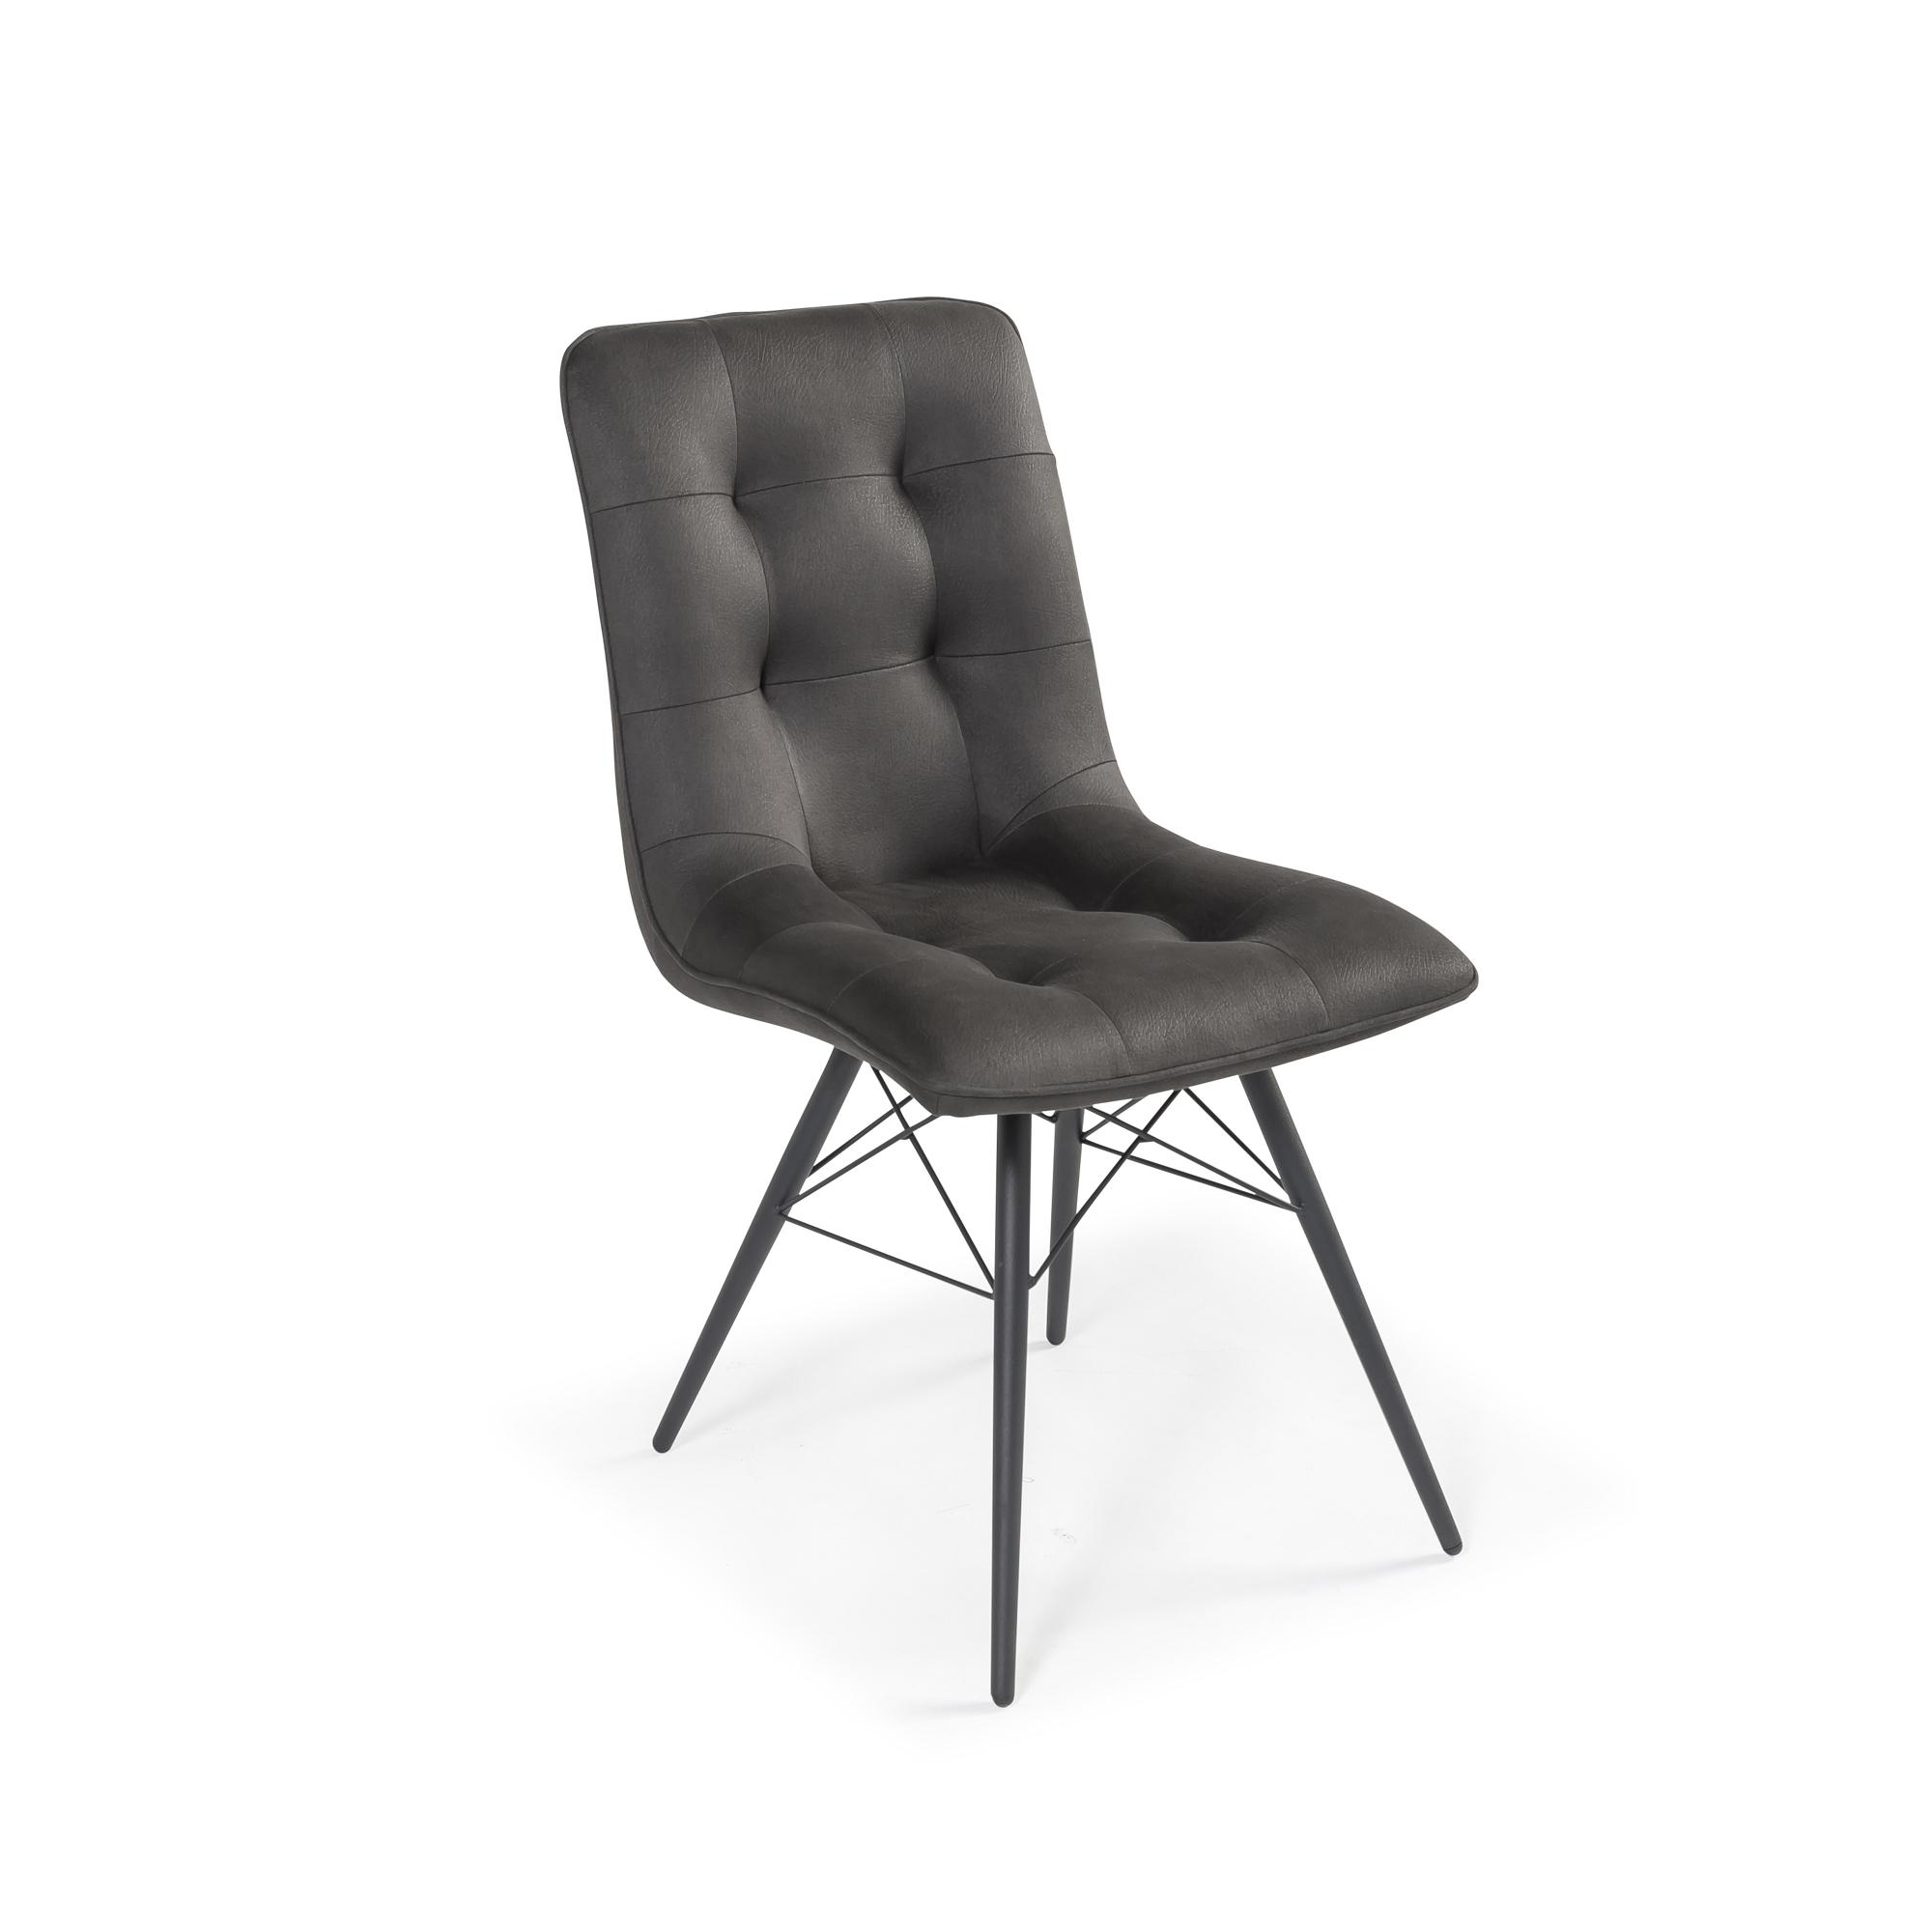 Madrid Dark Grey Modern Dining Chairs (Set of 2)